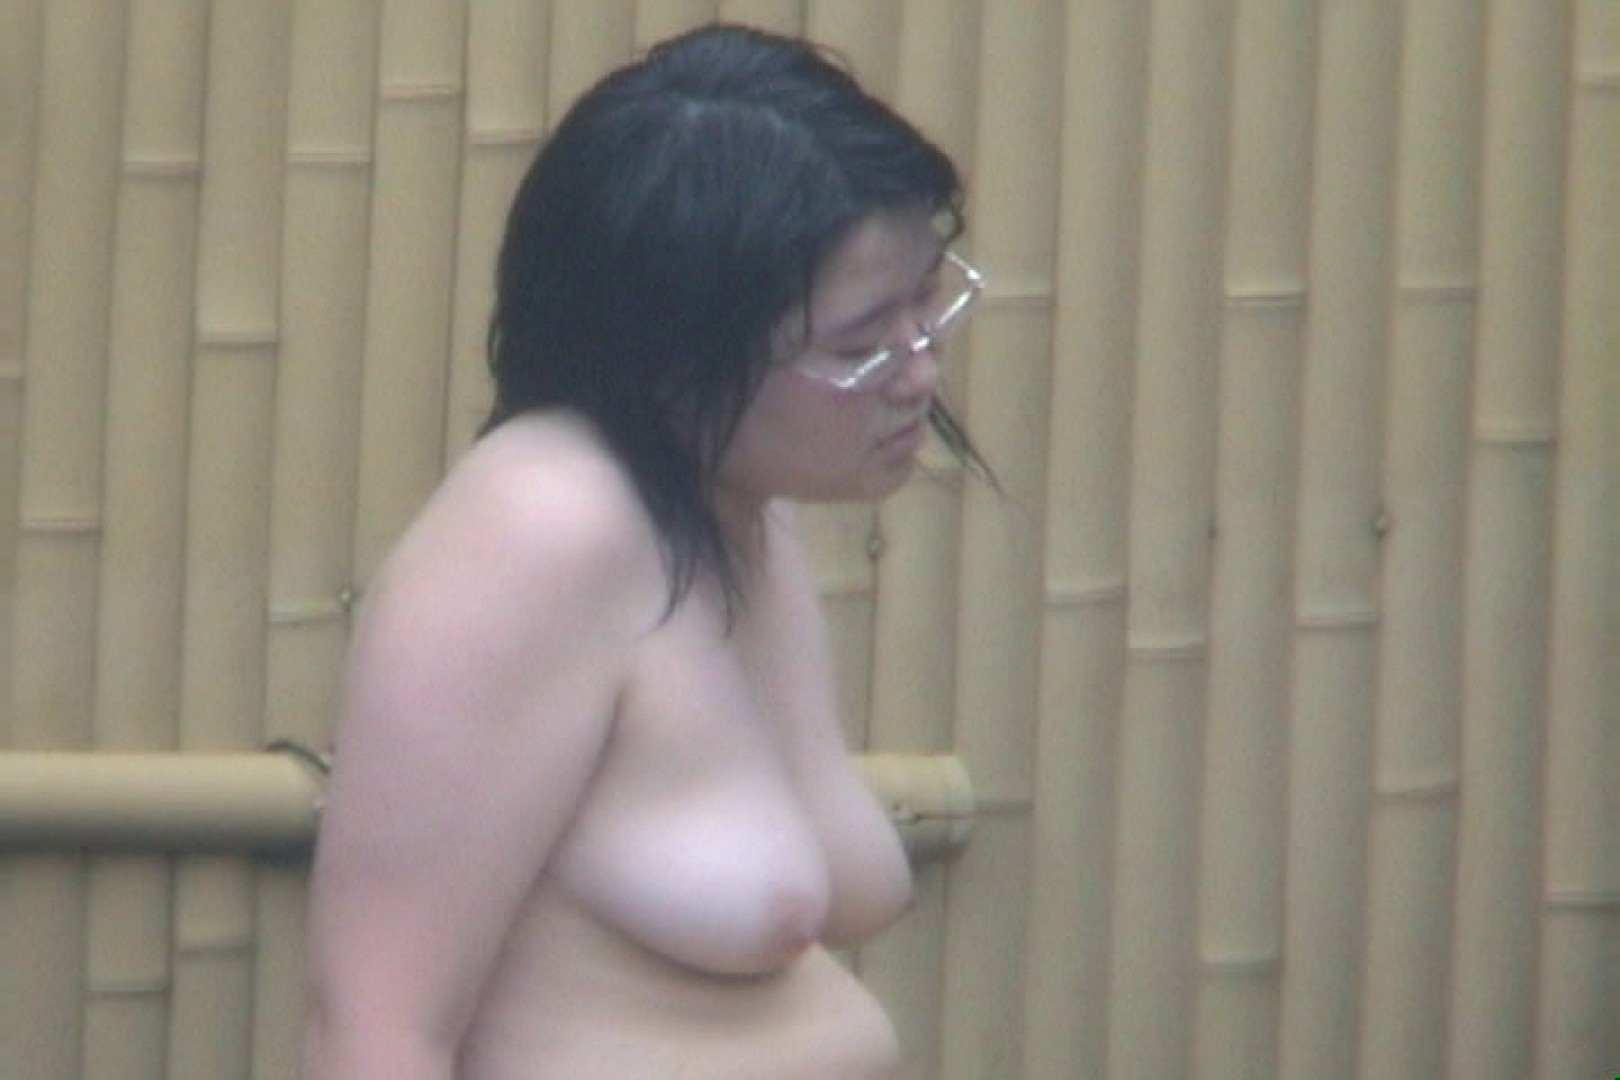 Aquaな露天風呂Vol.46【VIP限定】 いやらしいOL オマンコ動画キャプチャ 66連発 66